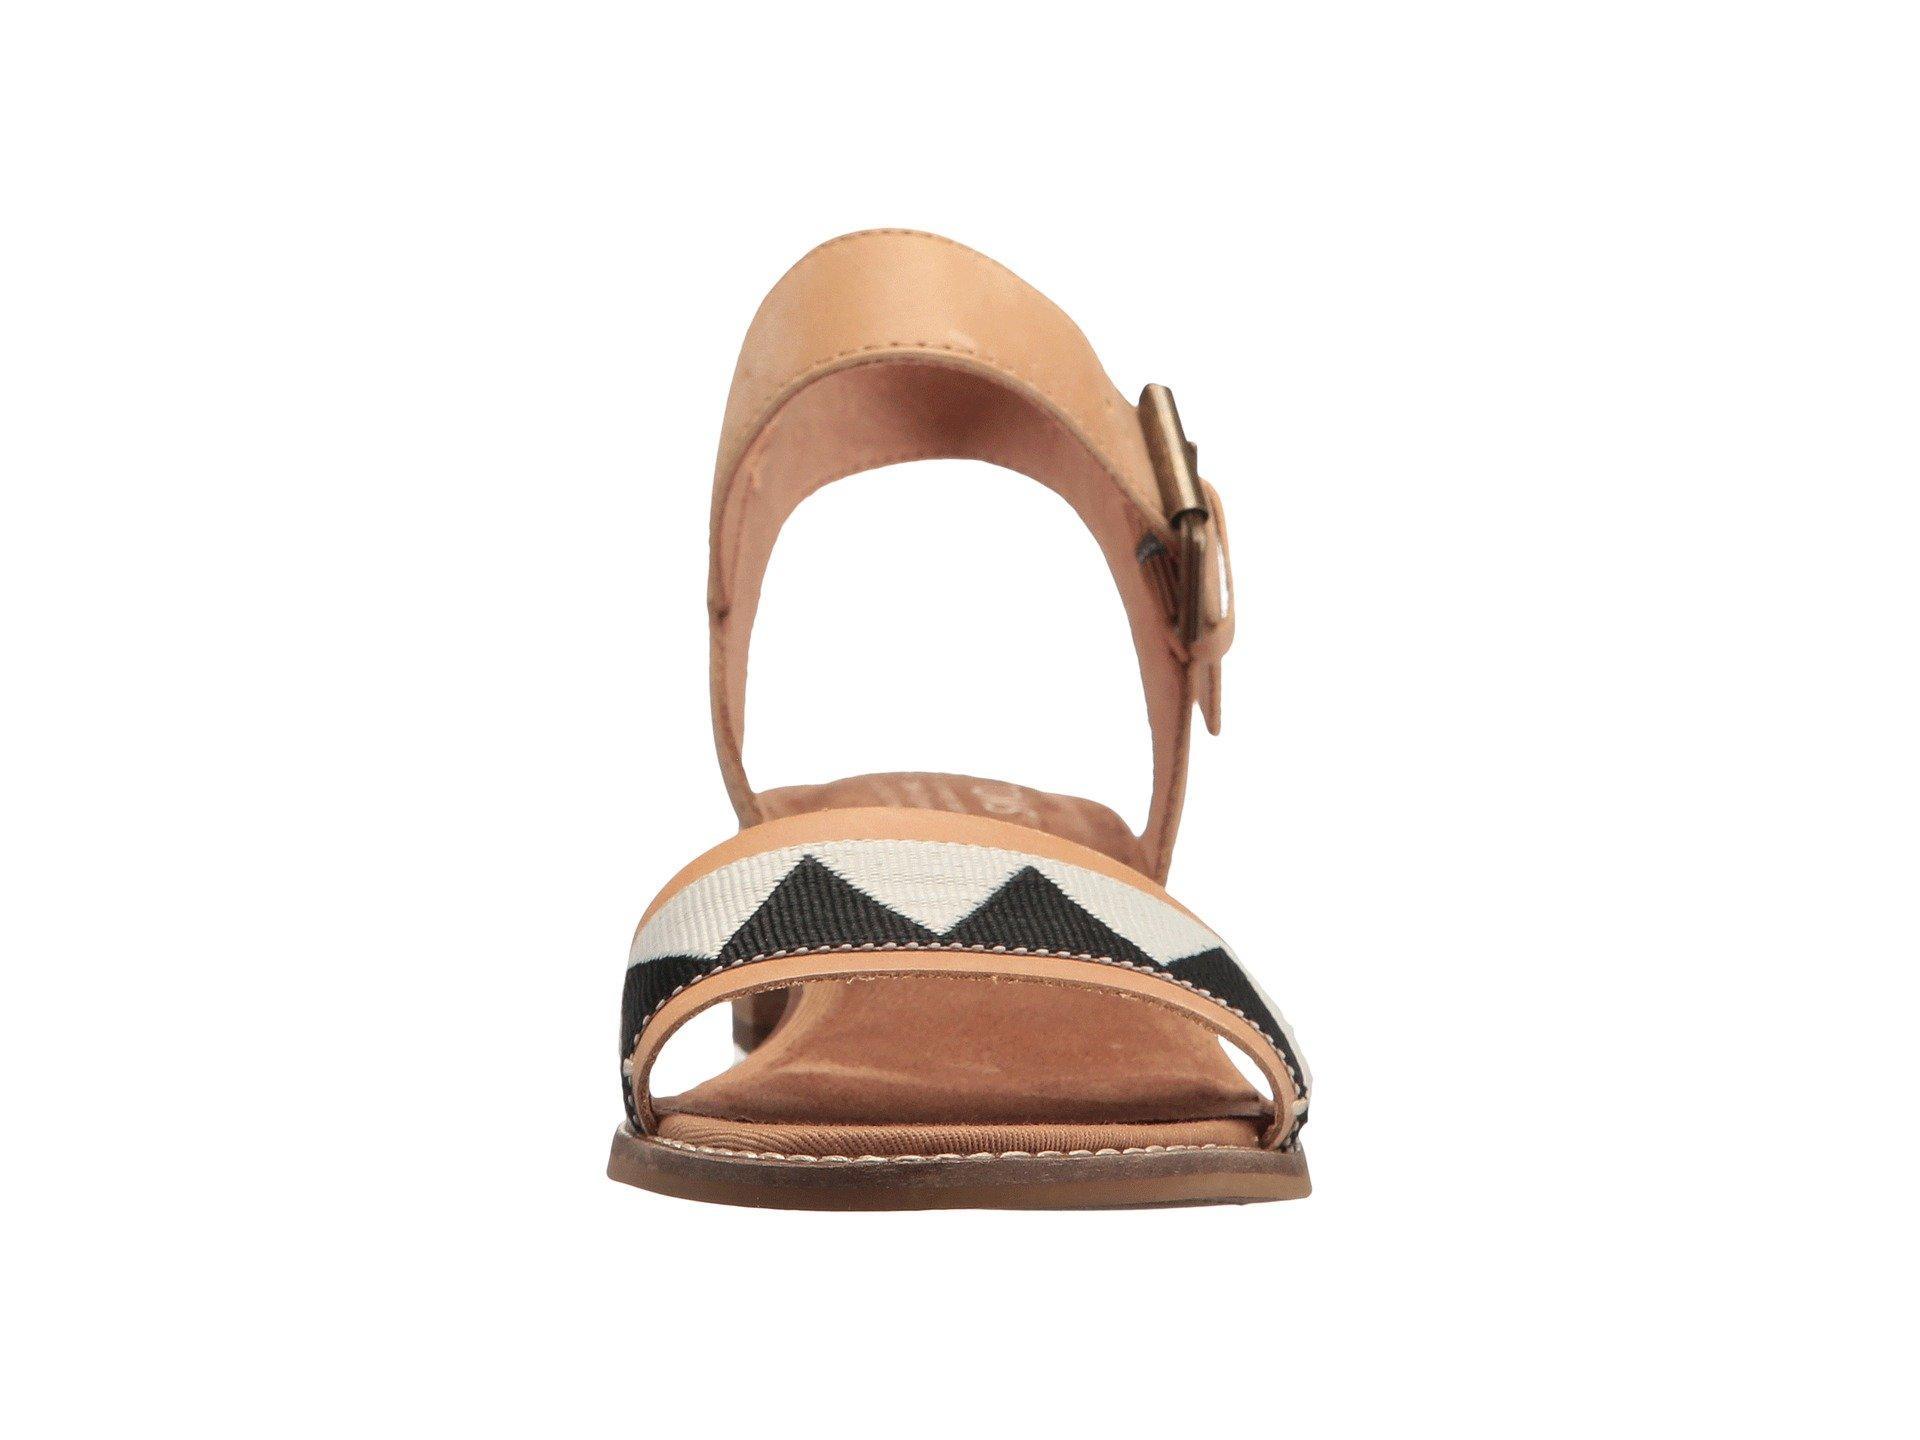 d867c69453a TOMS - Brown Camilia (honey Leather geometirc Woven) Women s Sandals -  Lyst. View fullscreen